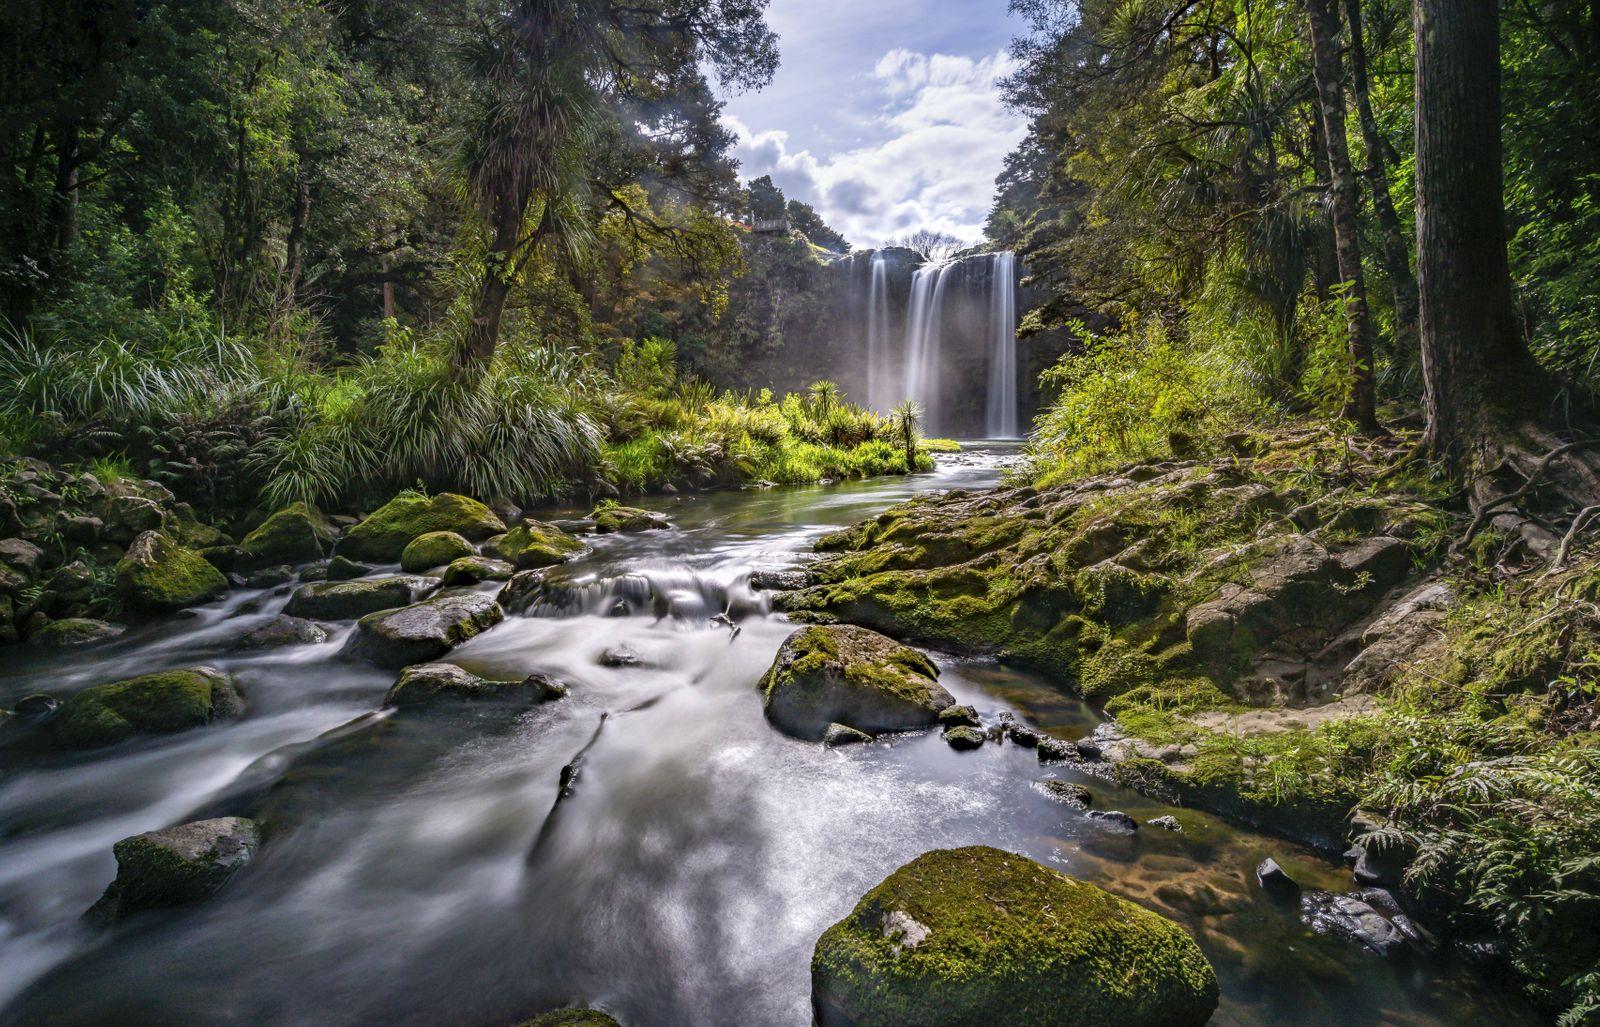 Wasserfall Whangarei Falls Fluss Hatea Whangarei Falls Scenic Reserve Northland Nordinsel Neus